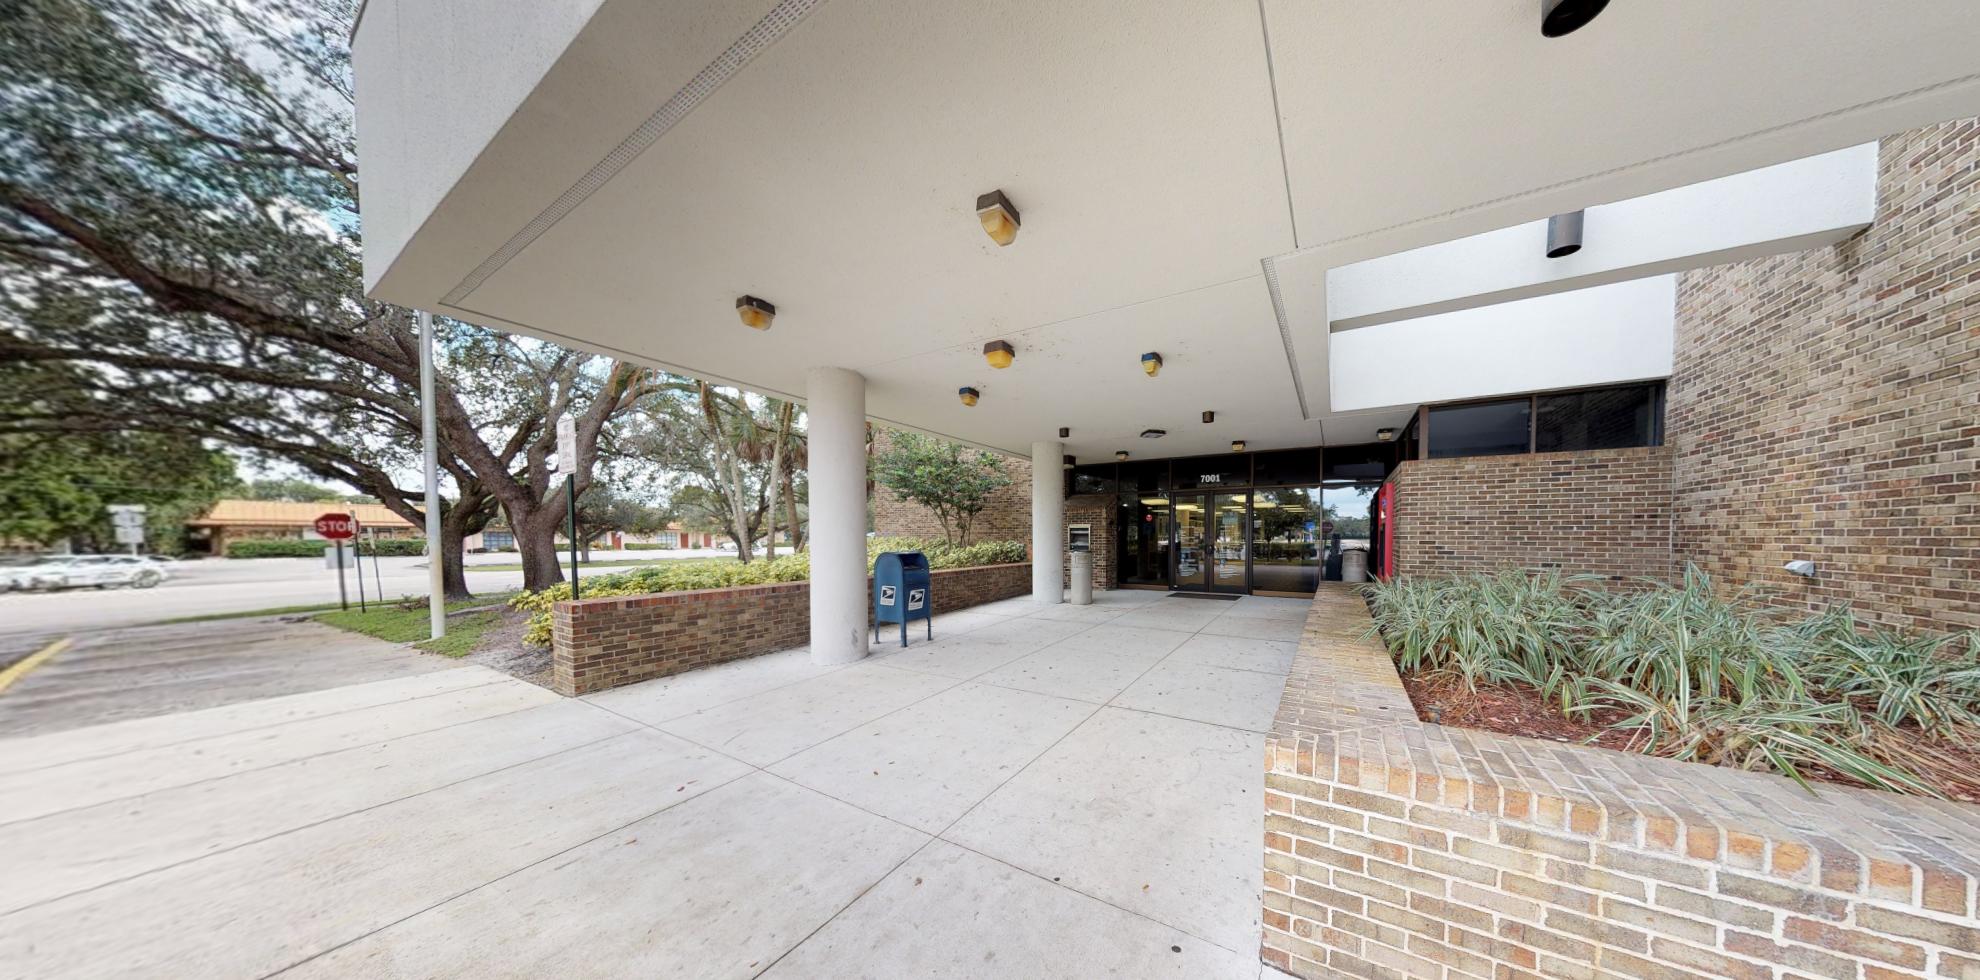 Bank of America financial center with drive-thru ATM   7001 W Broward Blvd, Plantation, FL 33317